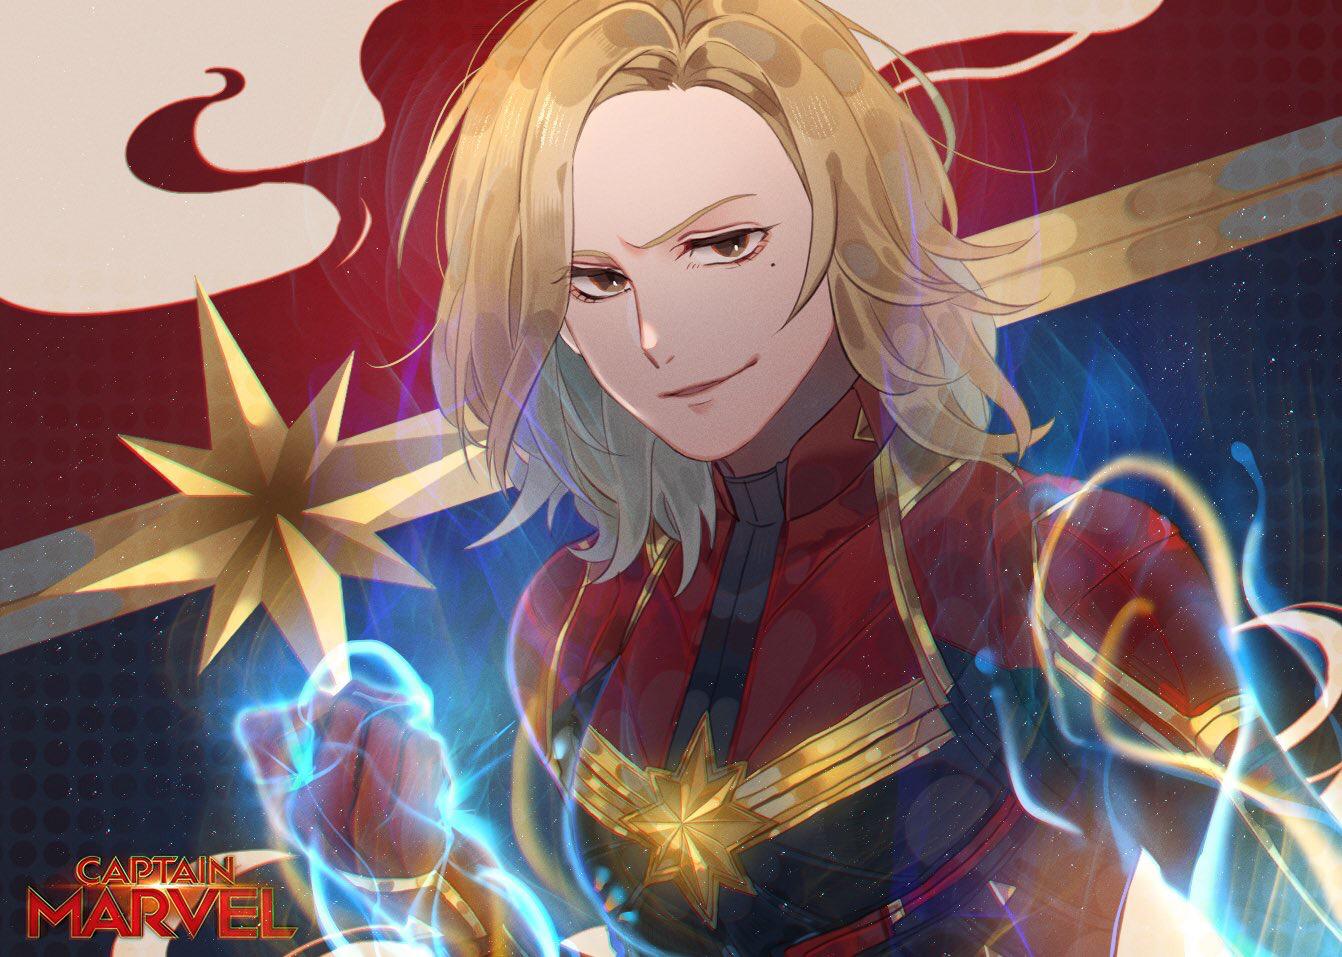 captain marvel - carol danvers - image #2510243 - zerochan anime